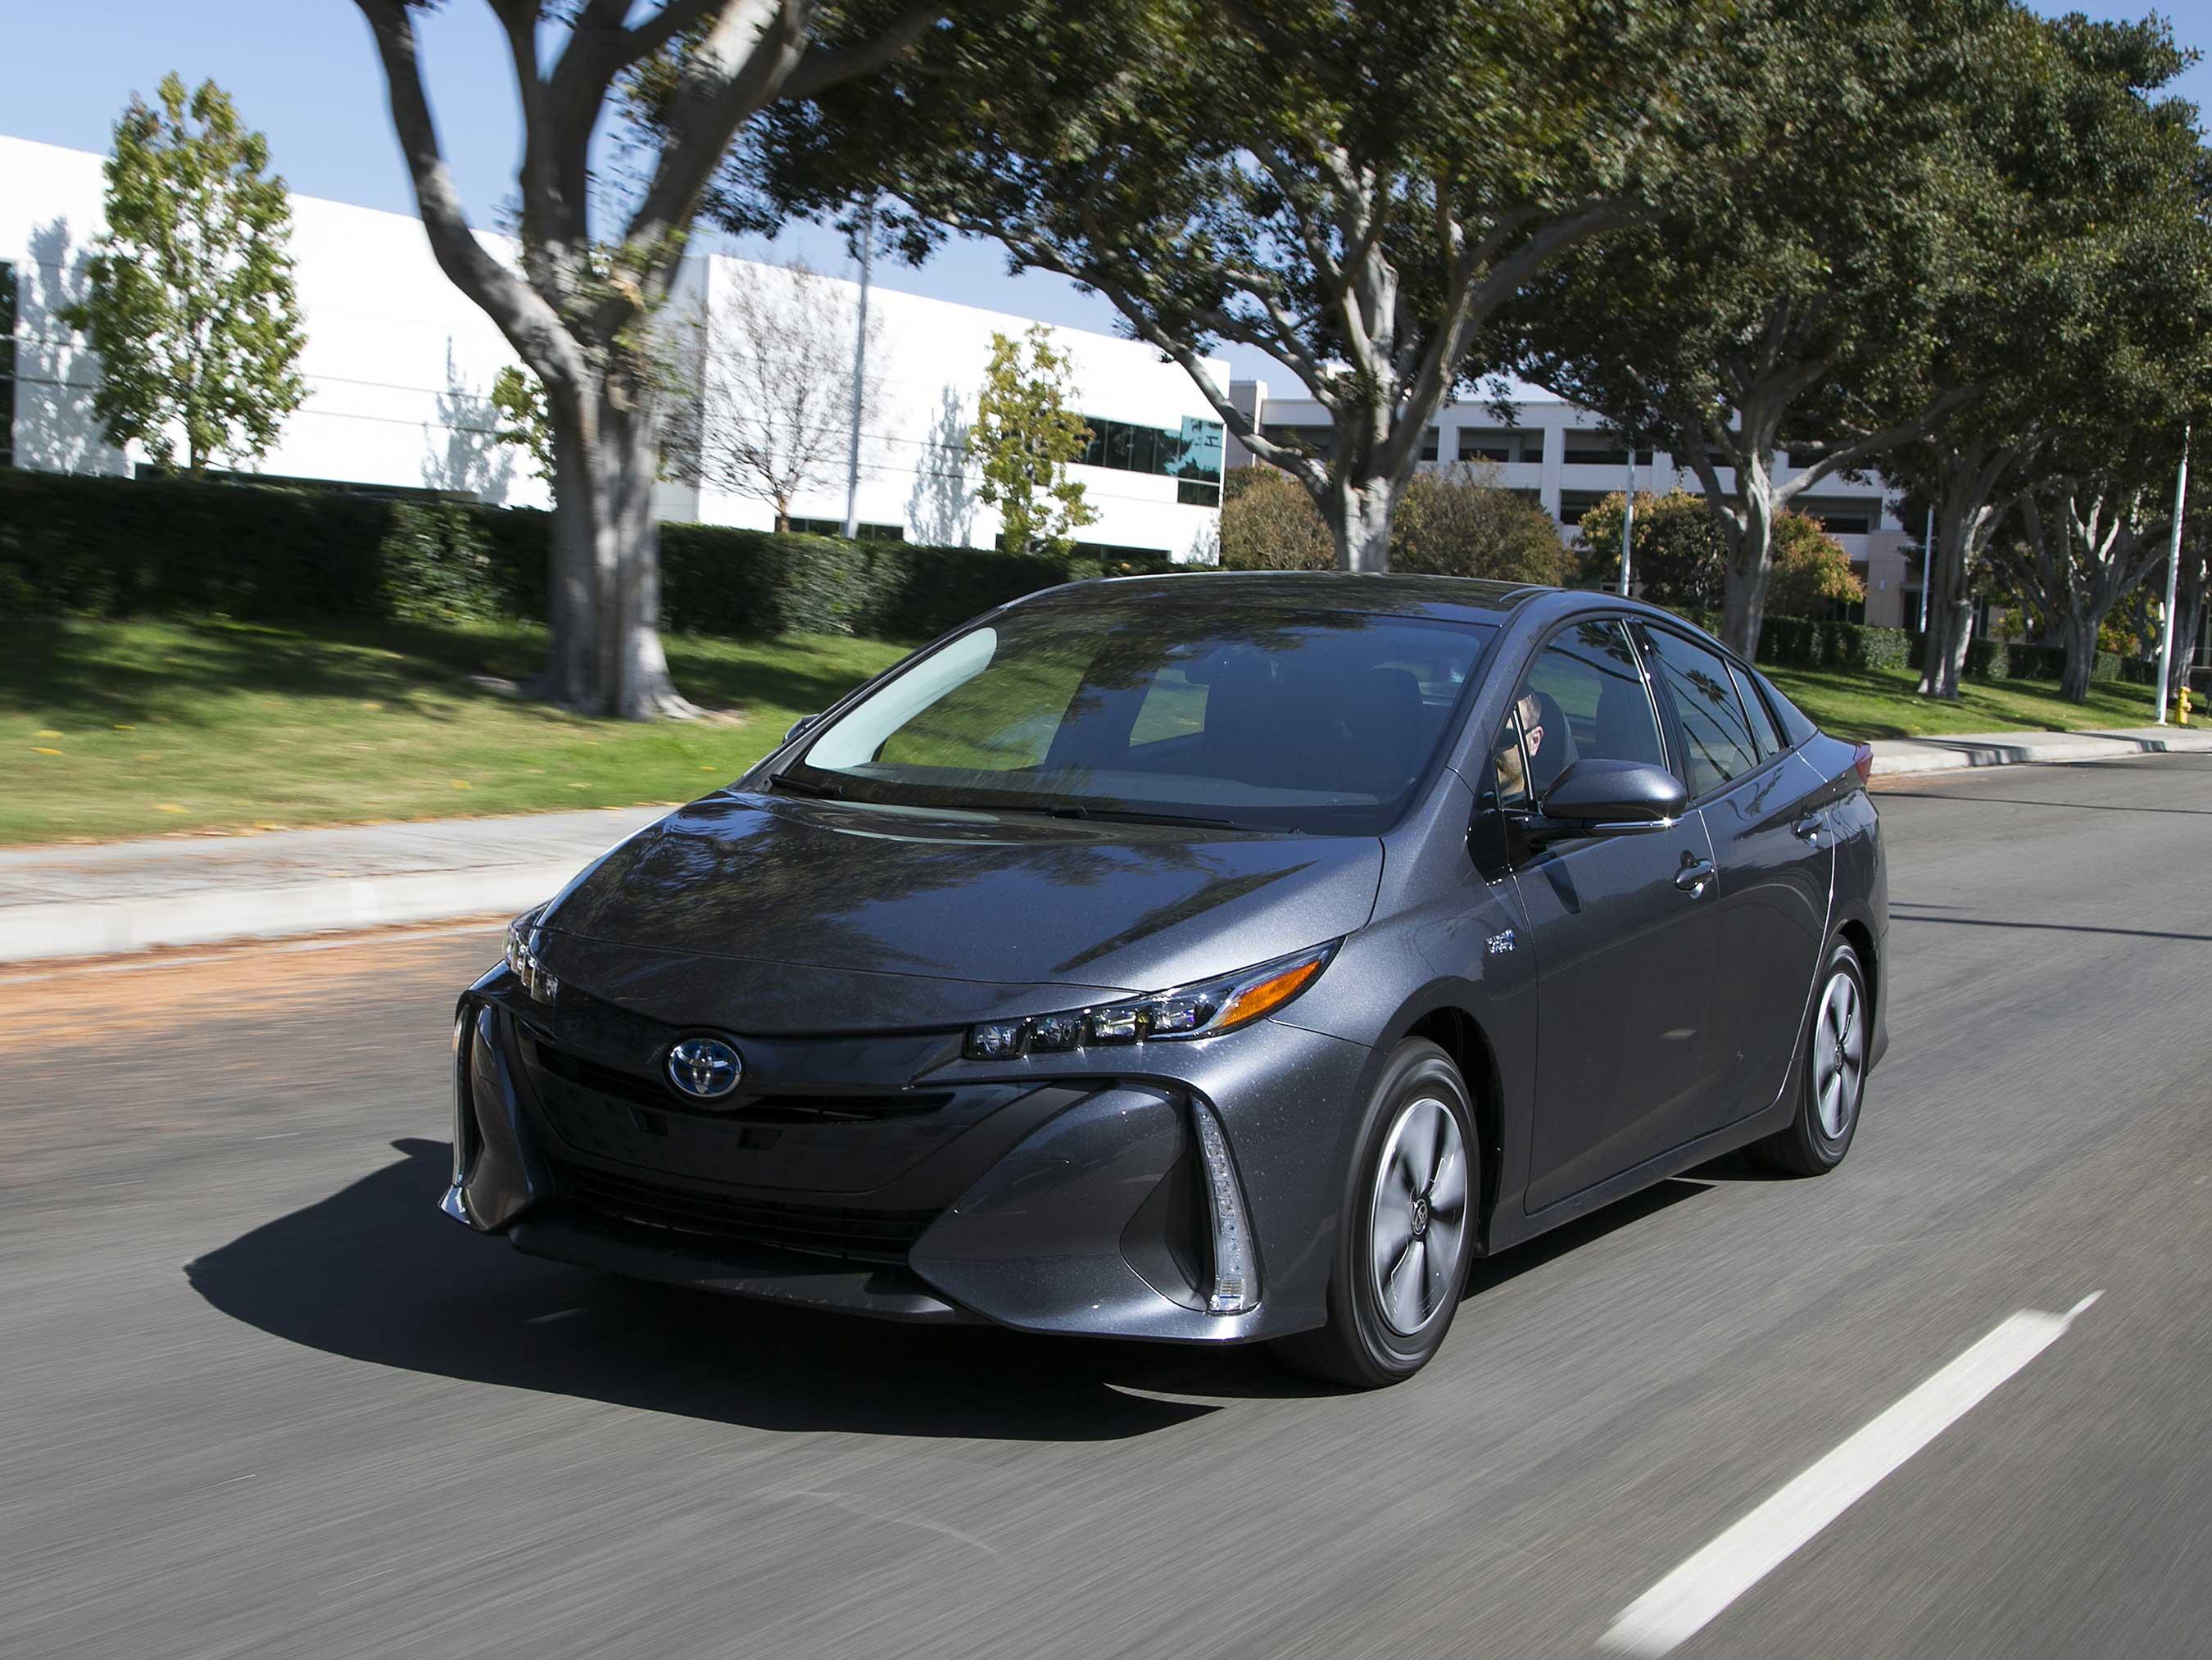 2017 Best Buy: Toyota Prius Prime